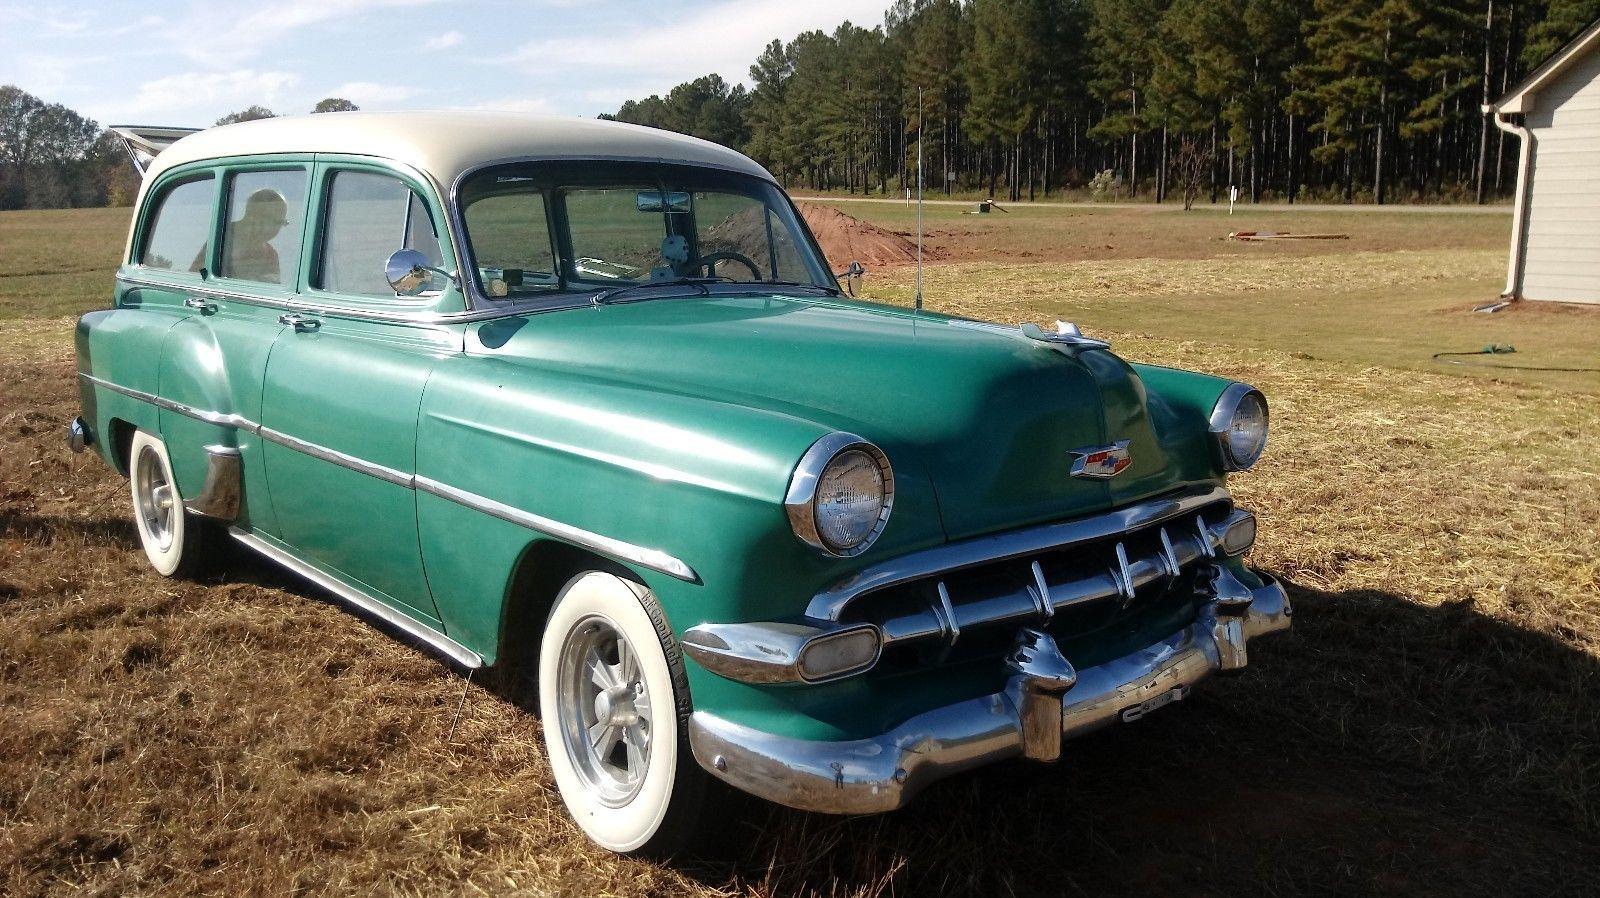 eBay: 1956 Chevrolet Nomad 1956, chevrolet bel air/150/210 project ...